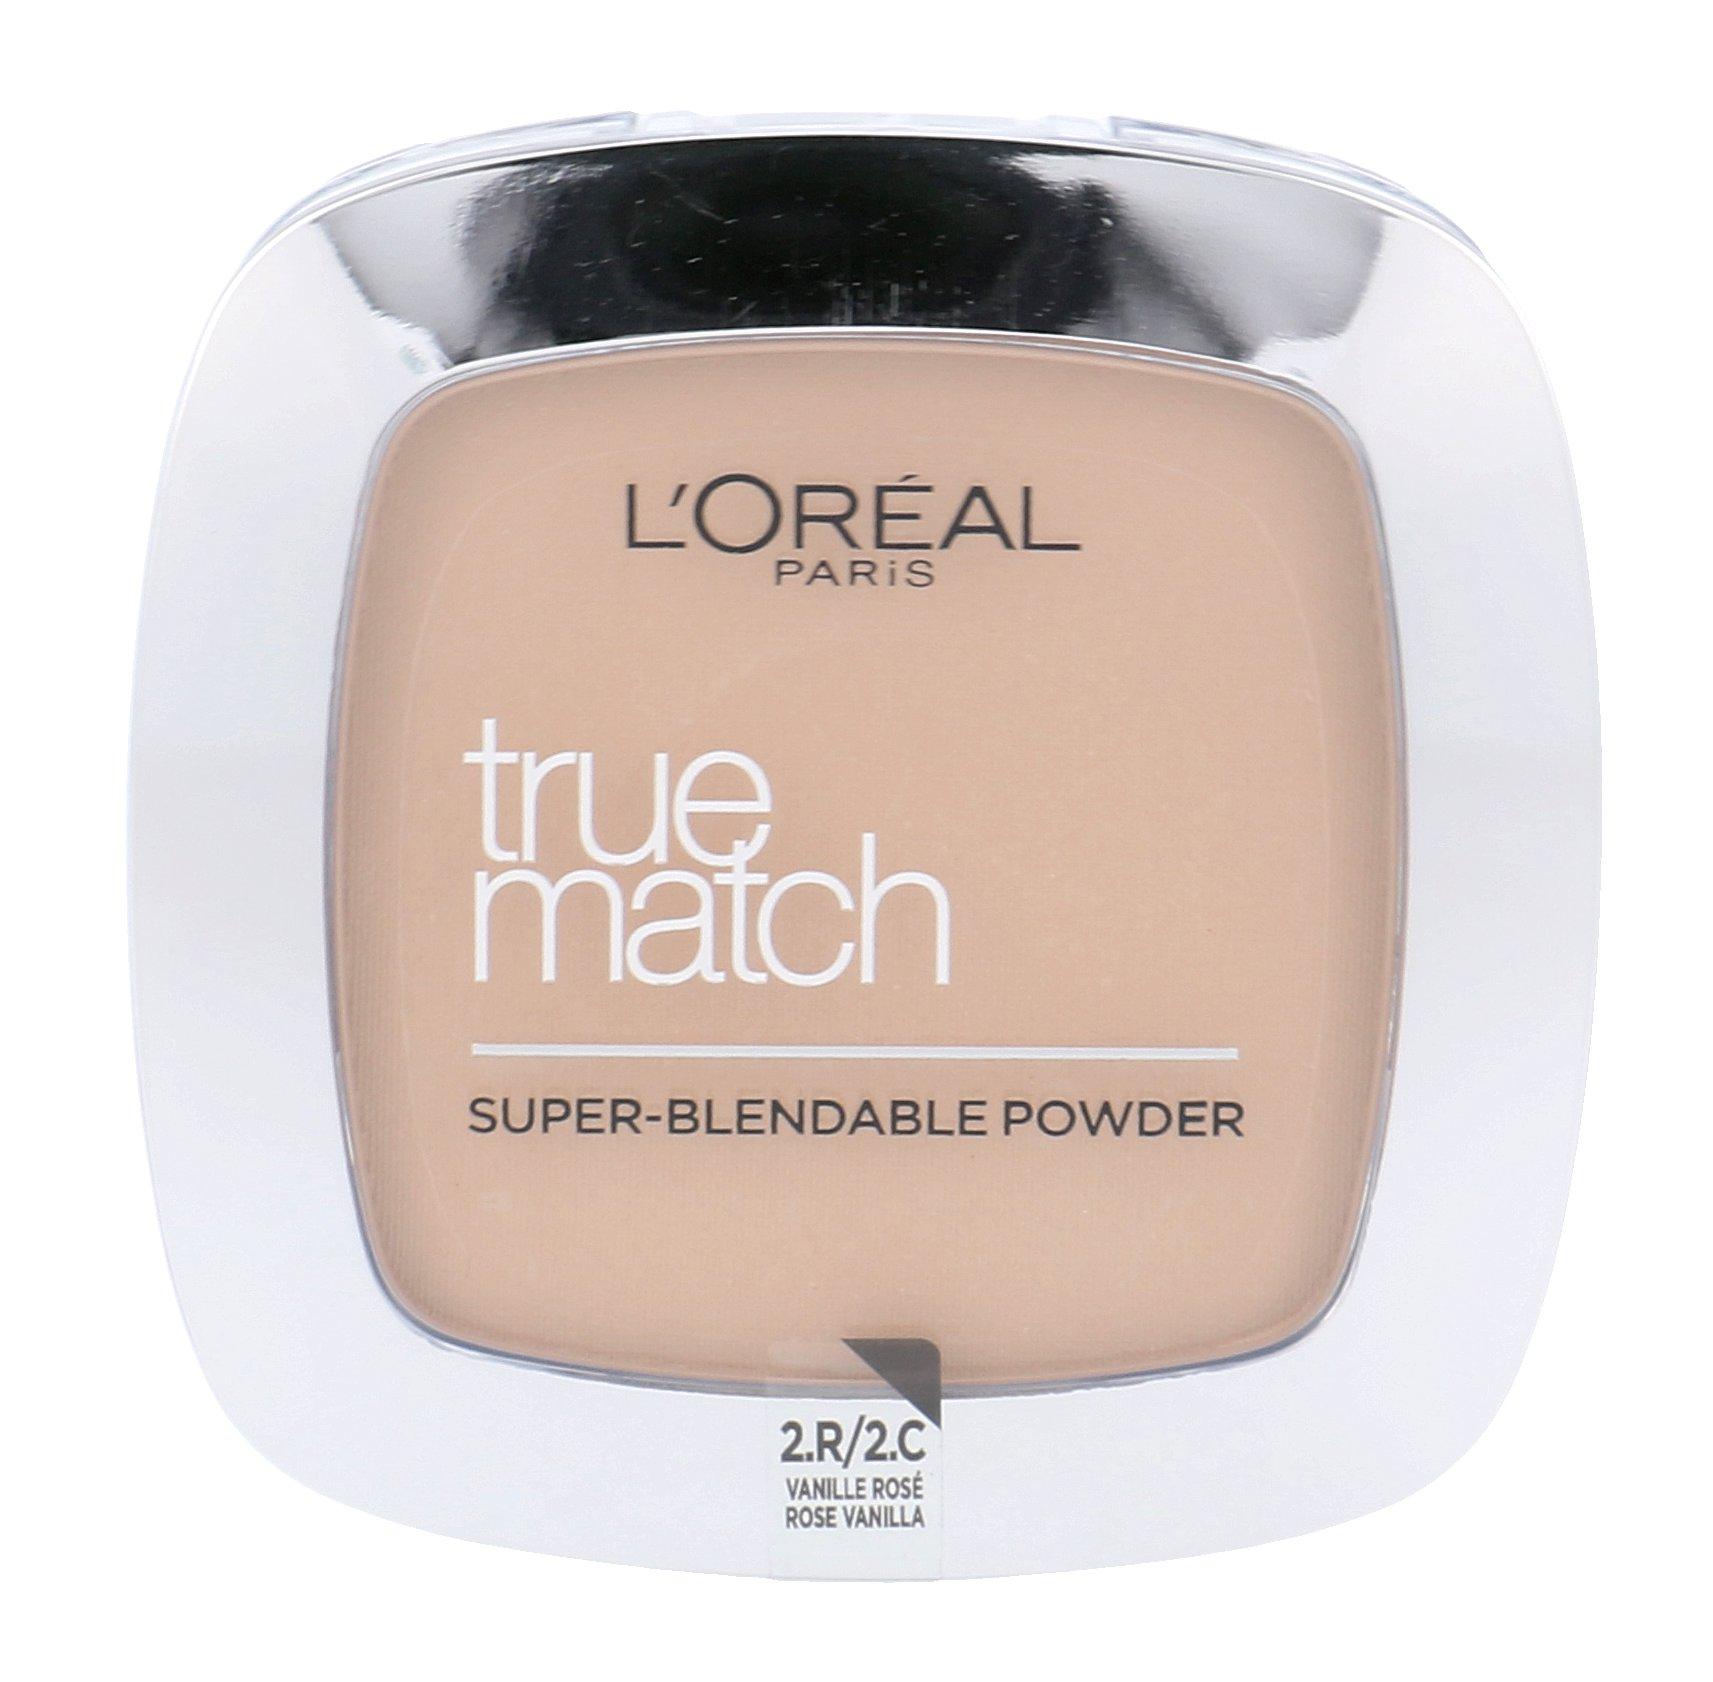 L´Oreal Paris True Match Super-Blendable Powder (R2/C2 Rose Vanilla) 9 g